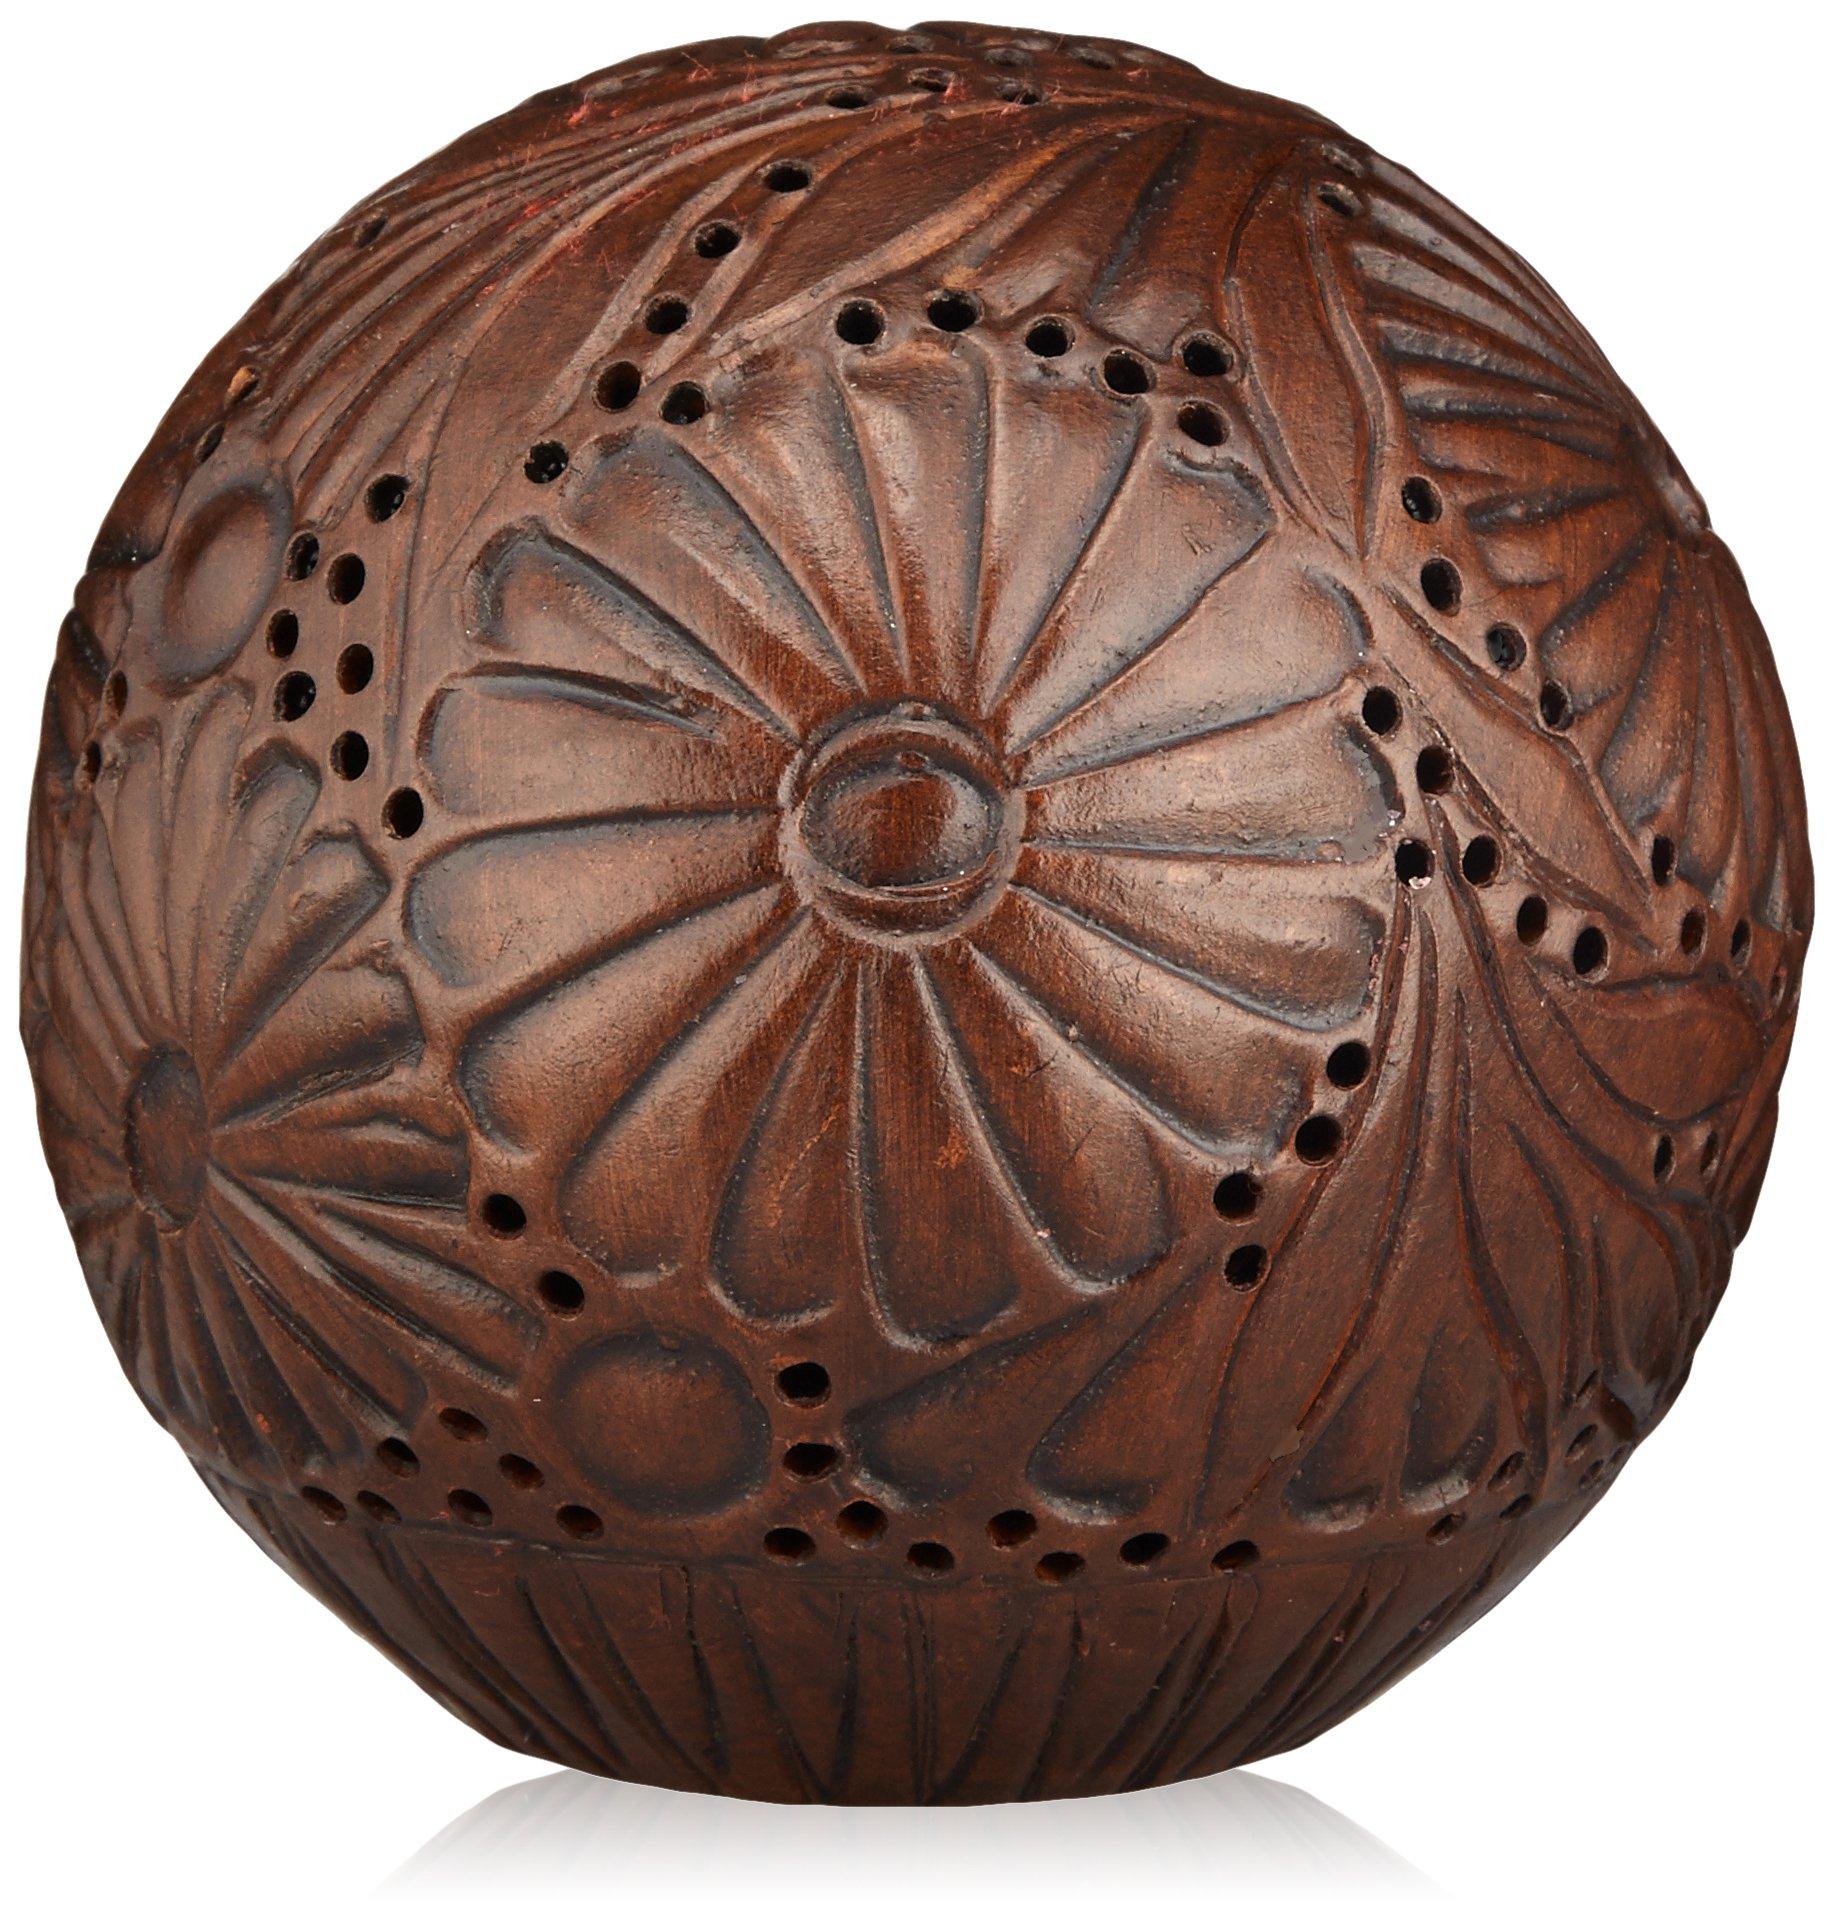 Handmade Terracotta Amber Ball by L'Artisan Parfumeur Home Fragrance (Diameter: 85mm (3.35 inches) Fill: 50g)